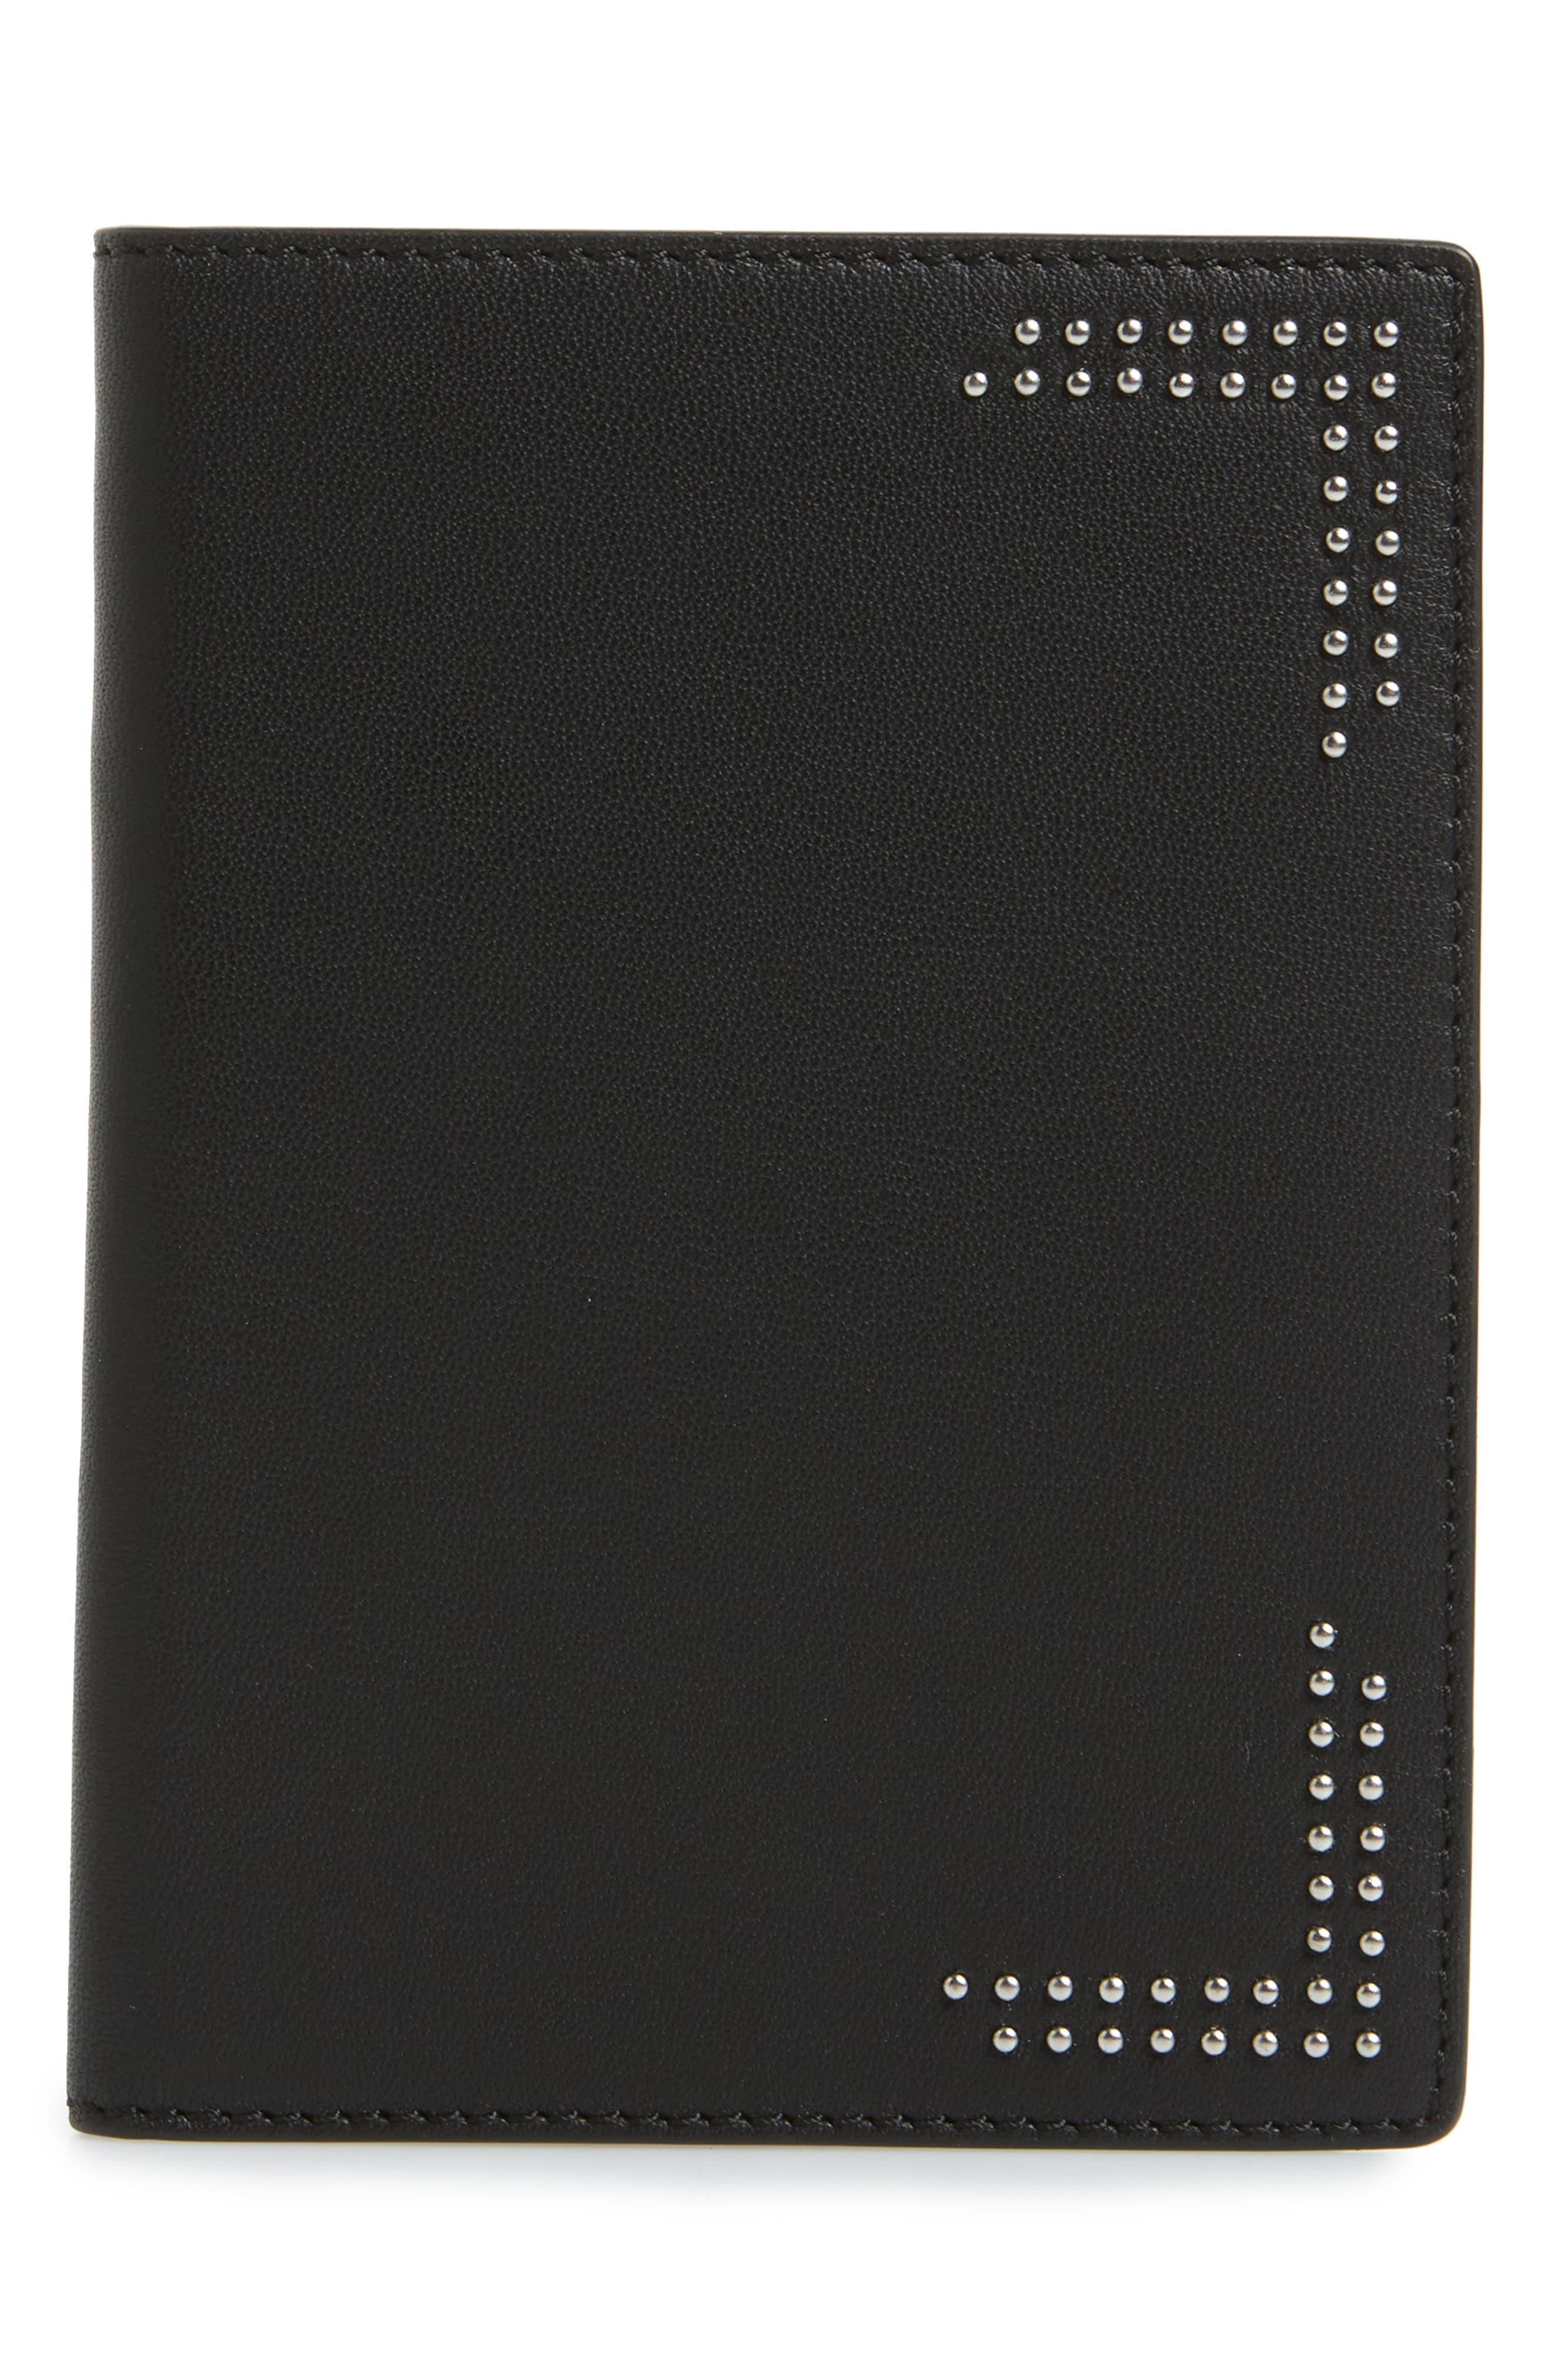 Alternate Image 1 Selected - Mackage Studded Nappa Leather Passport Holder